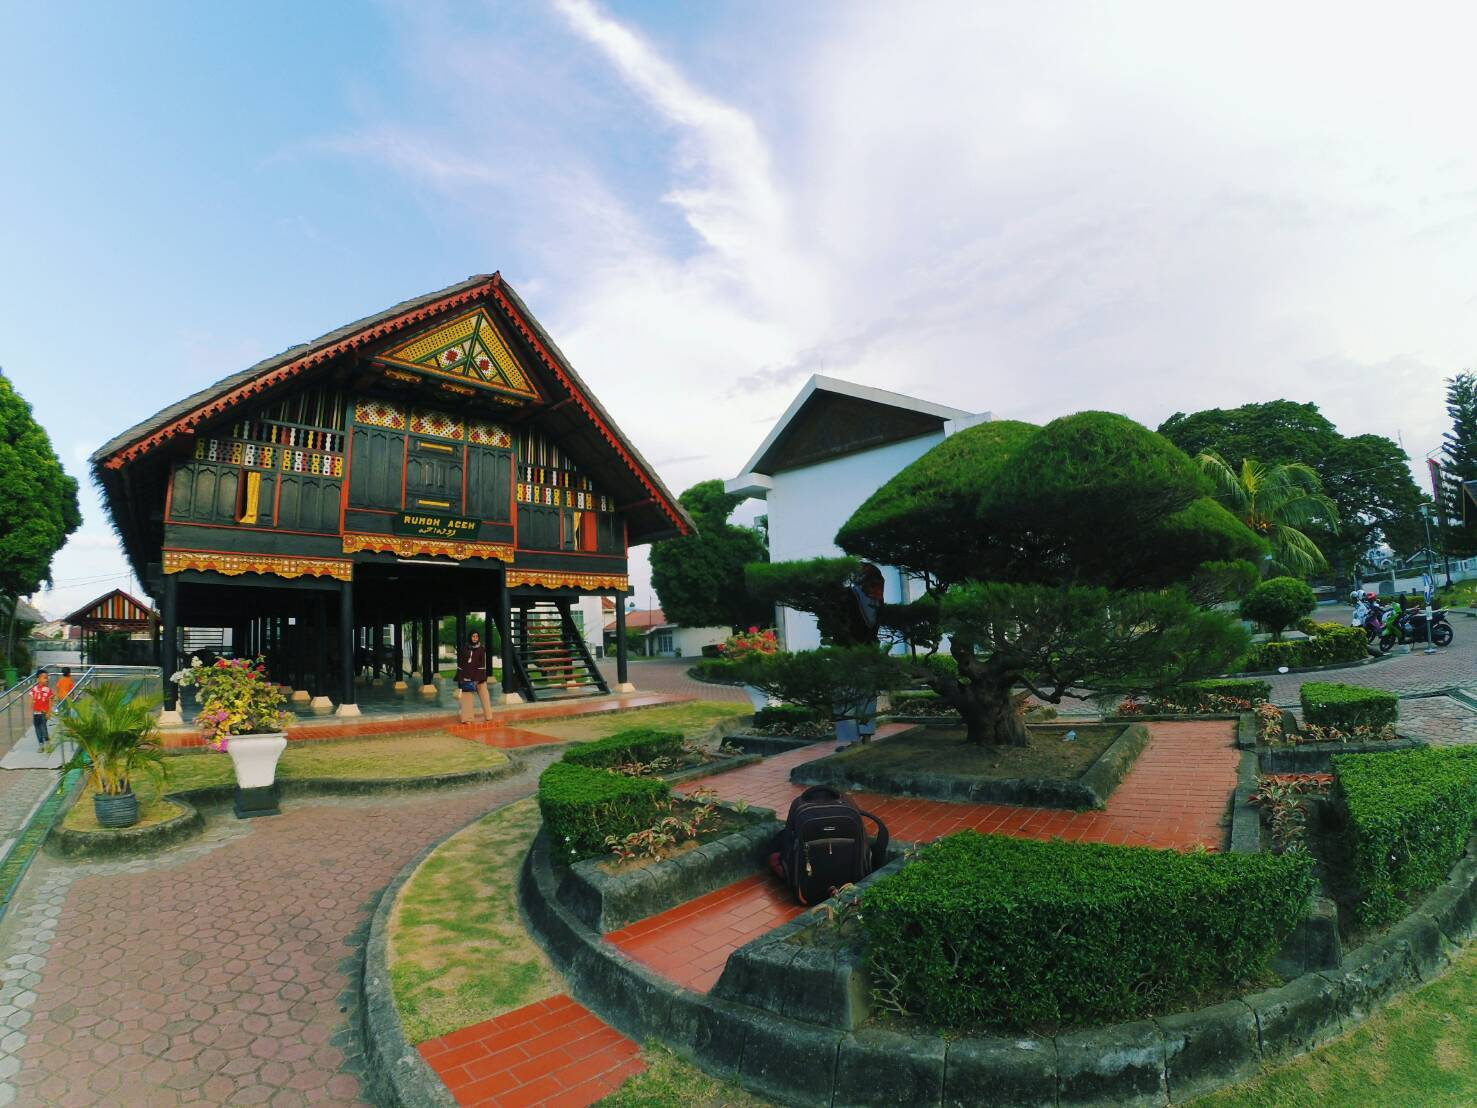 Kumpulan Cerita Unik Menarik Museum Rumah Aceh Kota Banda Berikut